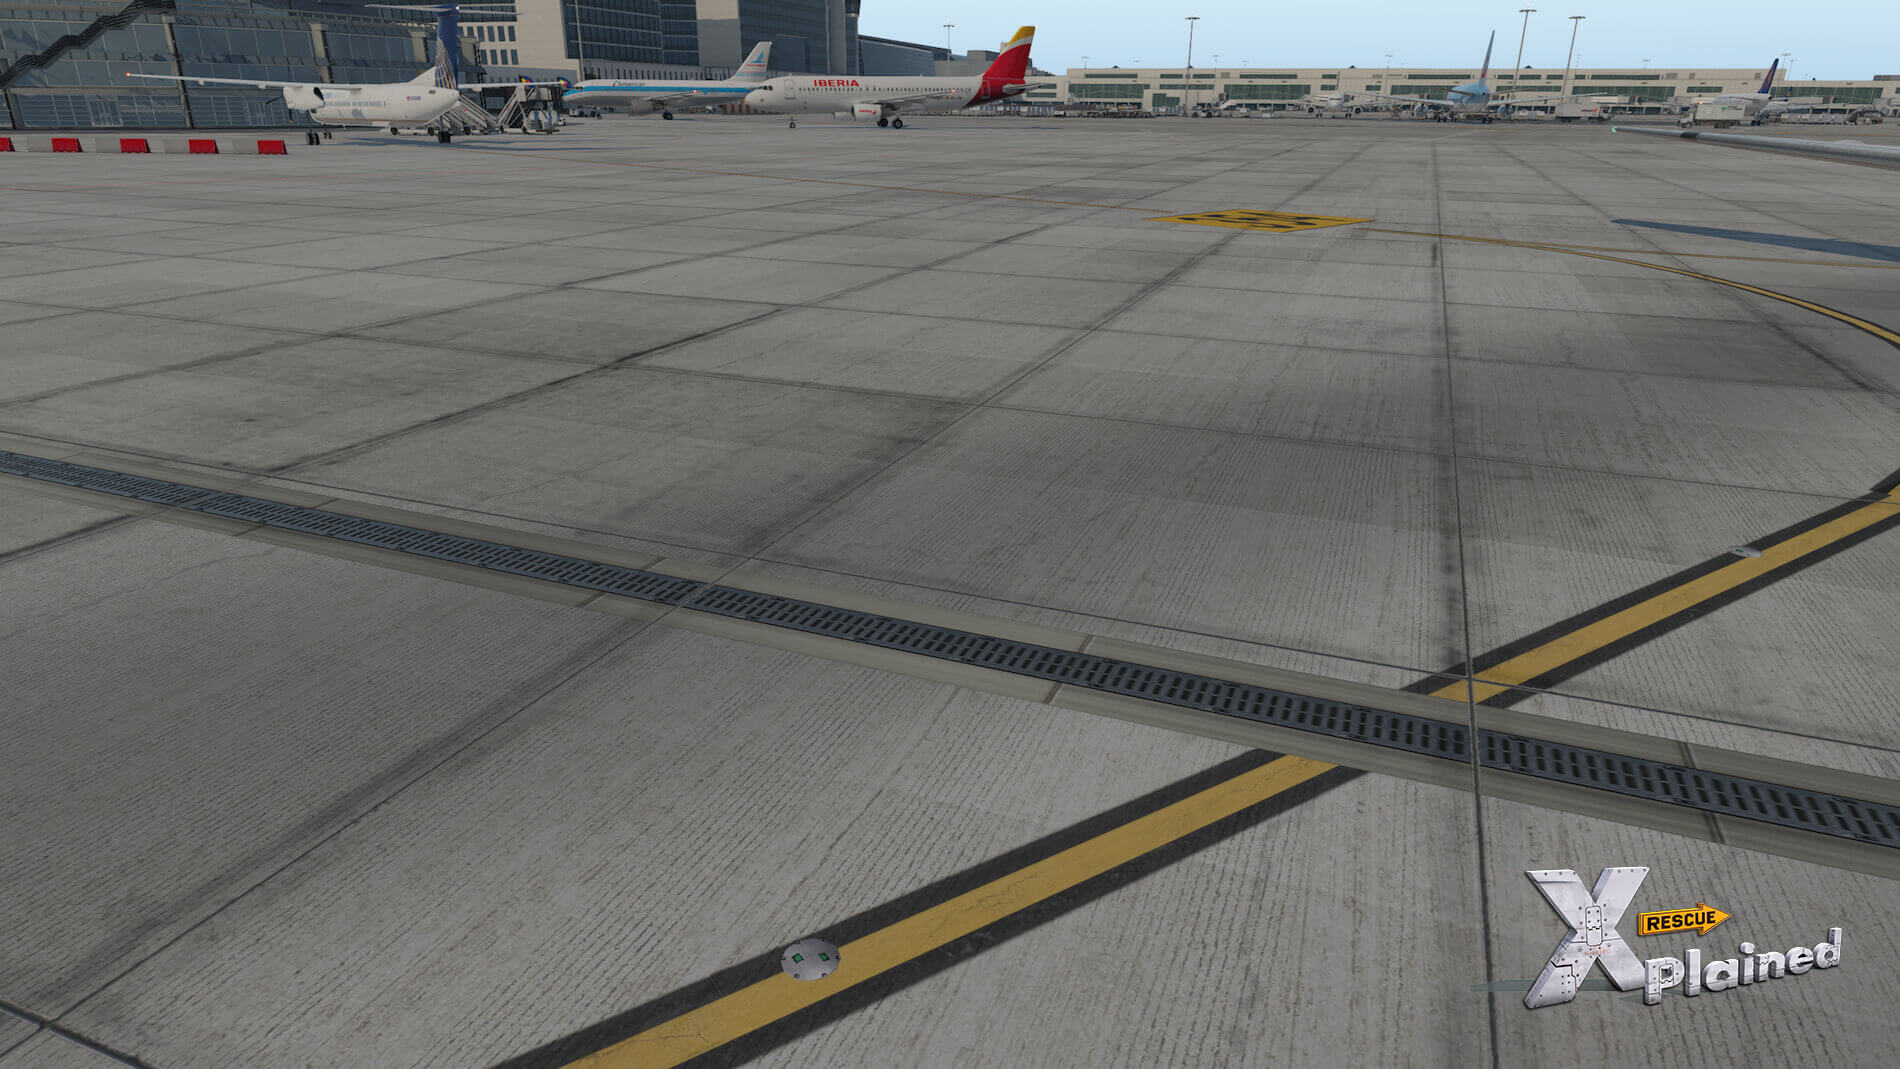 JustSim-EBBR-Airport-43